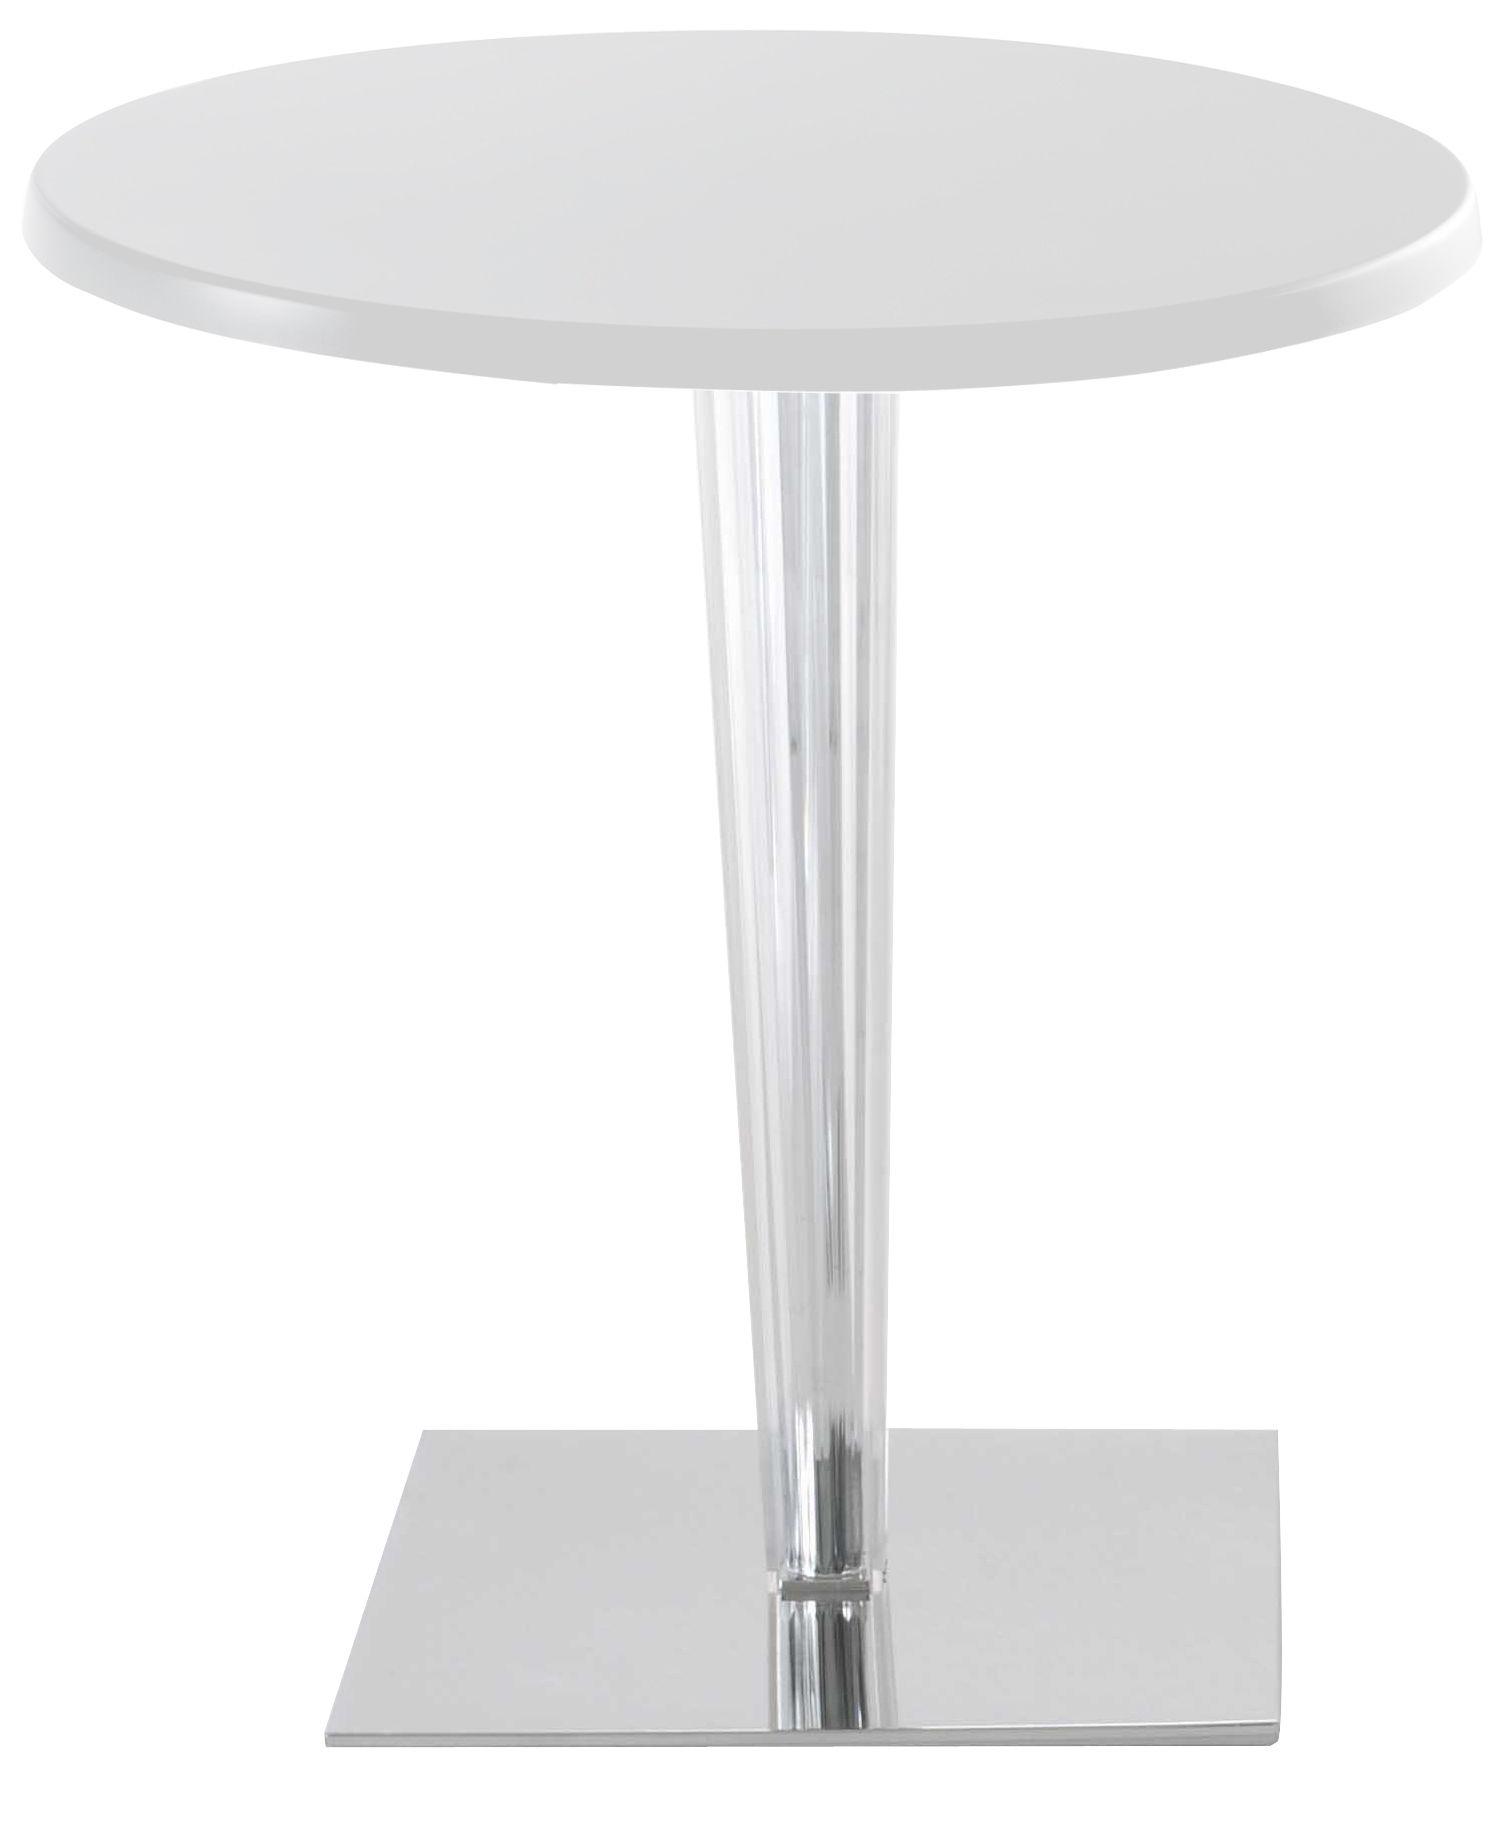 Mobilier - Tables - Table Top Top / Laquée - Ø 70 cm - Kartell - Blanc/ pied carré - Aluminium, PMMA, Polyester laqué